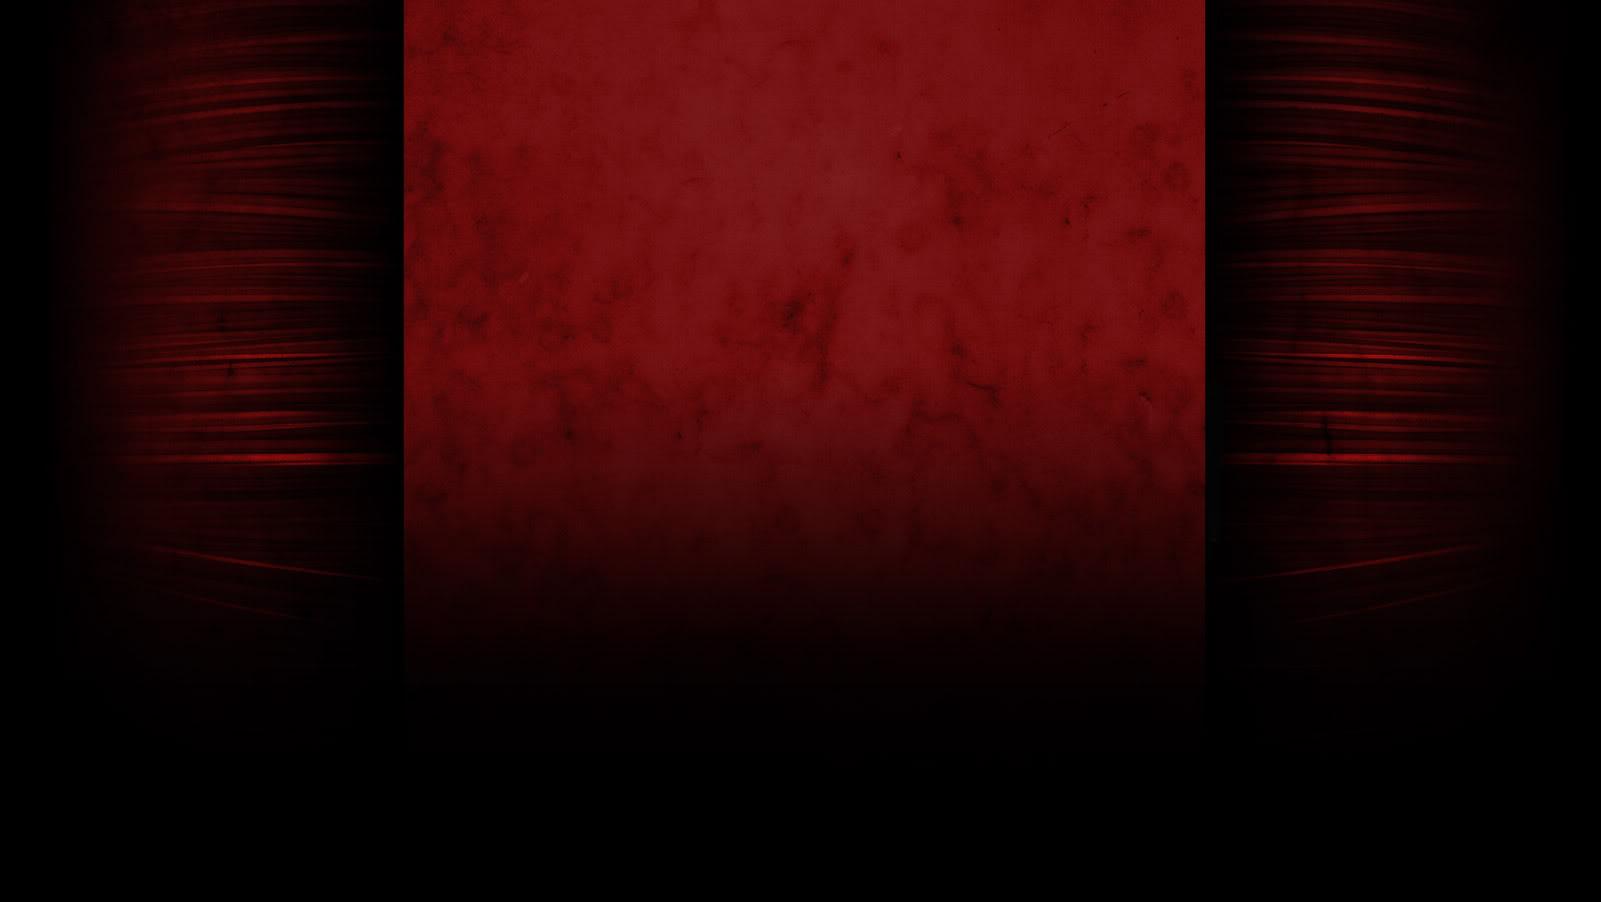 Red Black Grey Wallpaper  Wallpapersafari. Best Living Room Furniture For Cats. Platinum Birthday Club @ Living Room. Furniture Needed For Living Room. Living Room Brown Gray. Living Room Set Payment Plan. Living Room Ideas Red Black And White. Living Room Festival City. Living Room Planner 3d Online